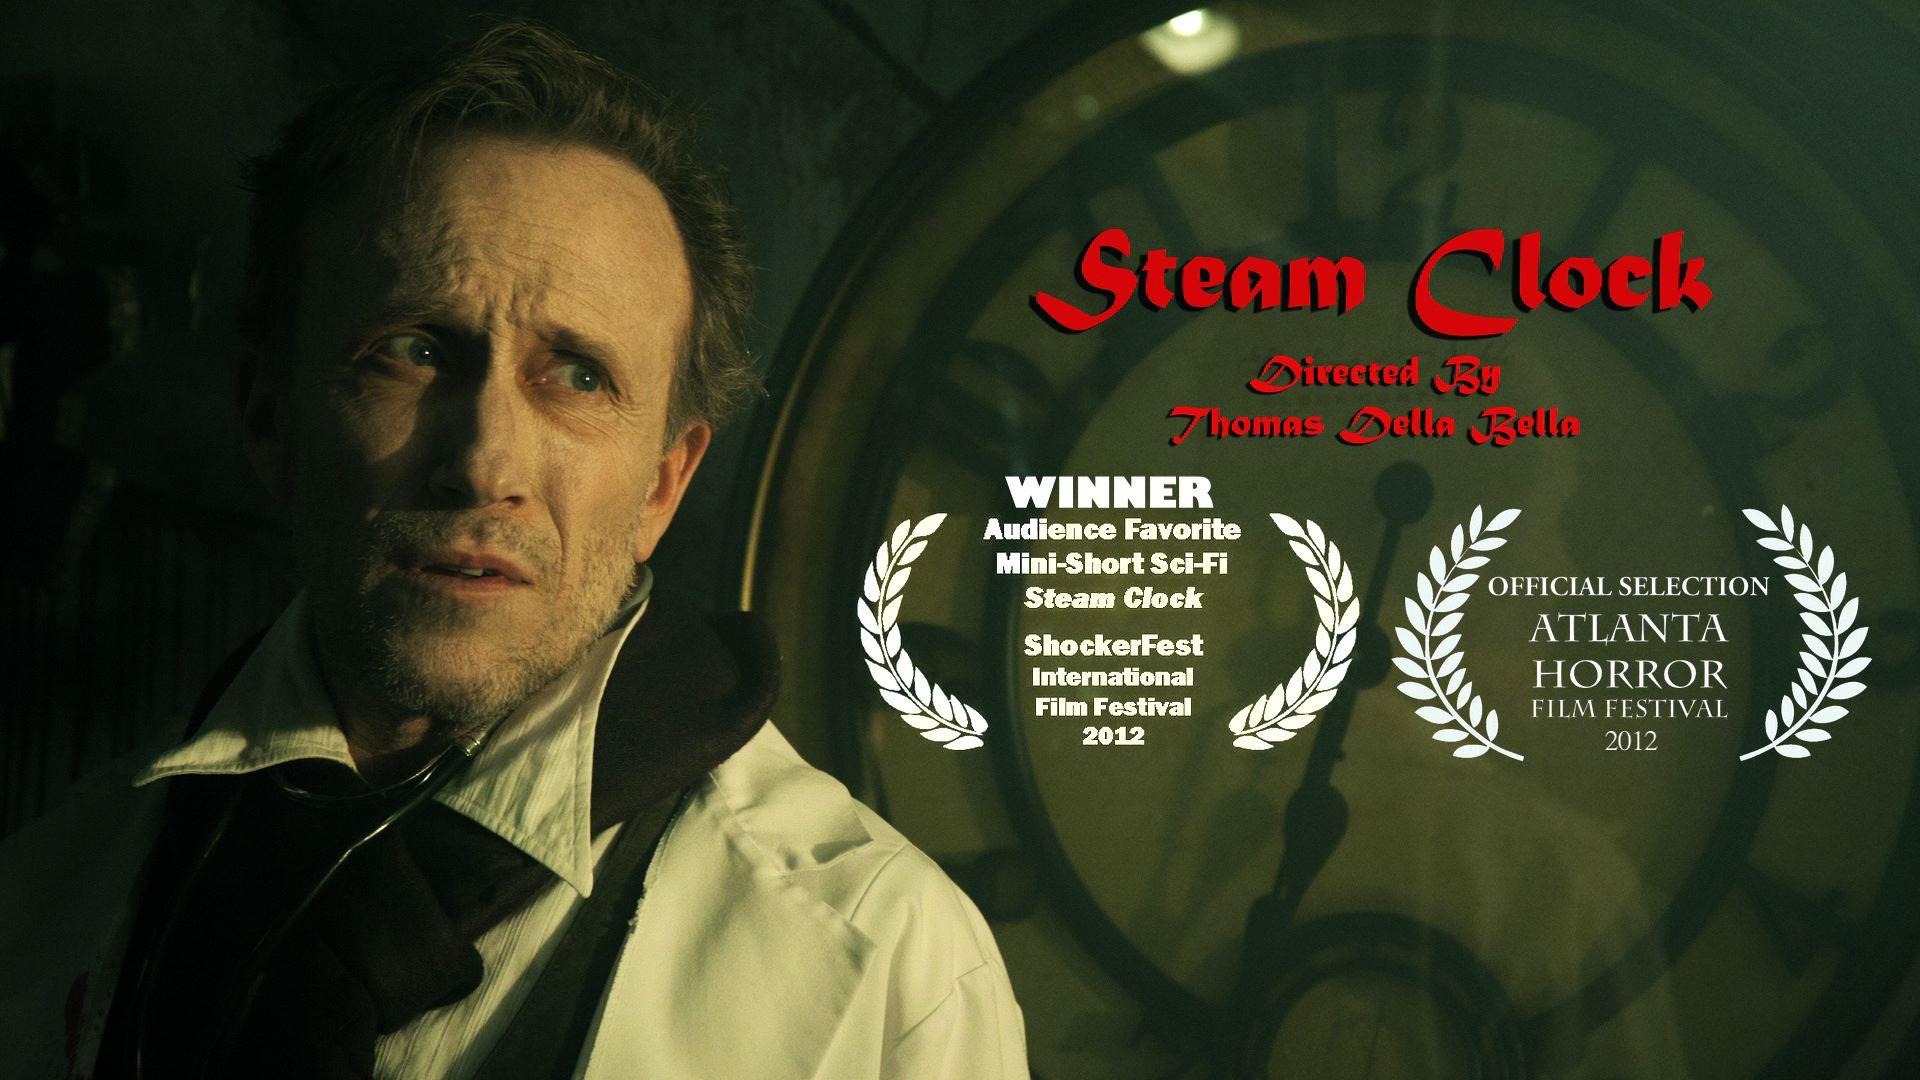 Steamclock